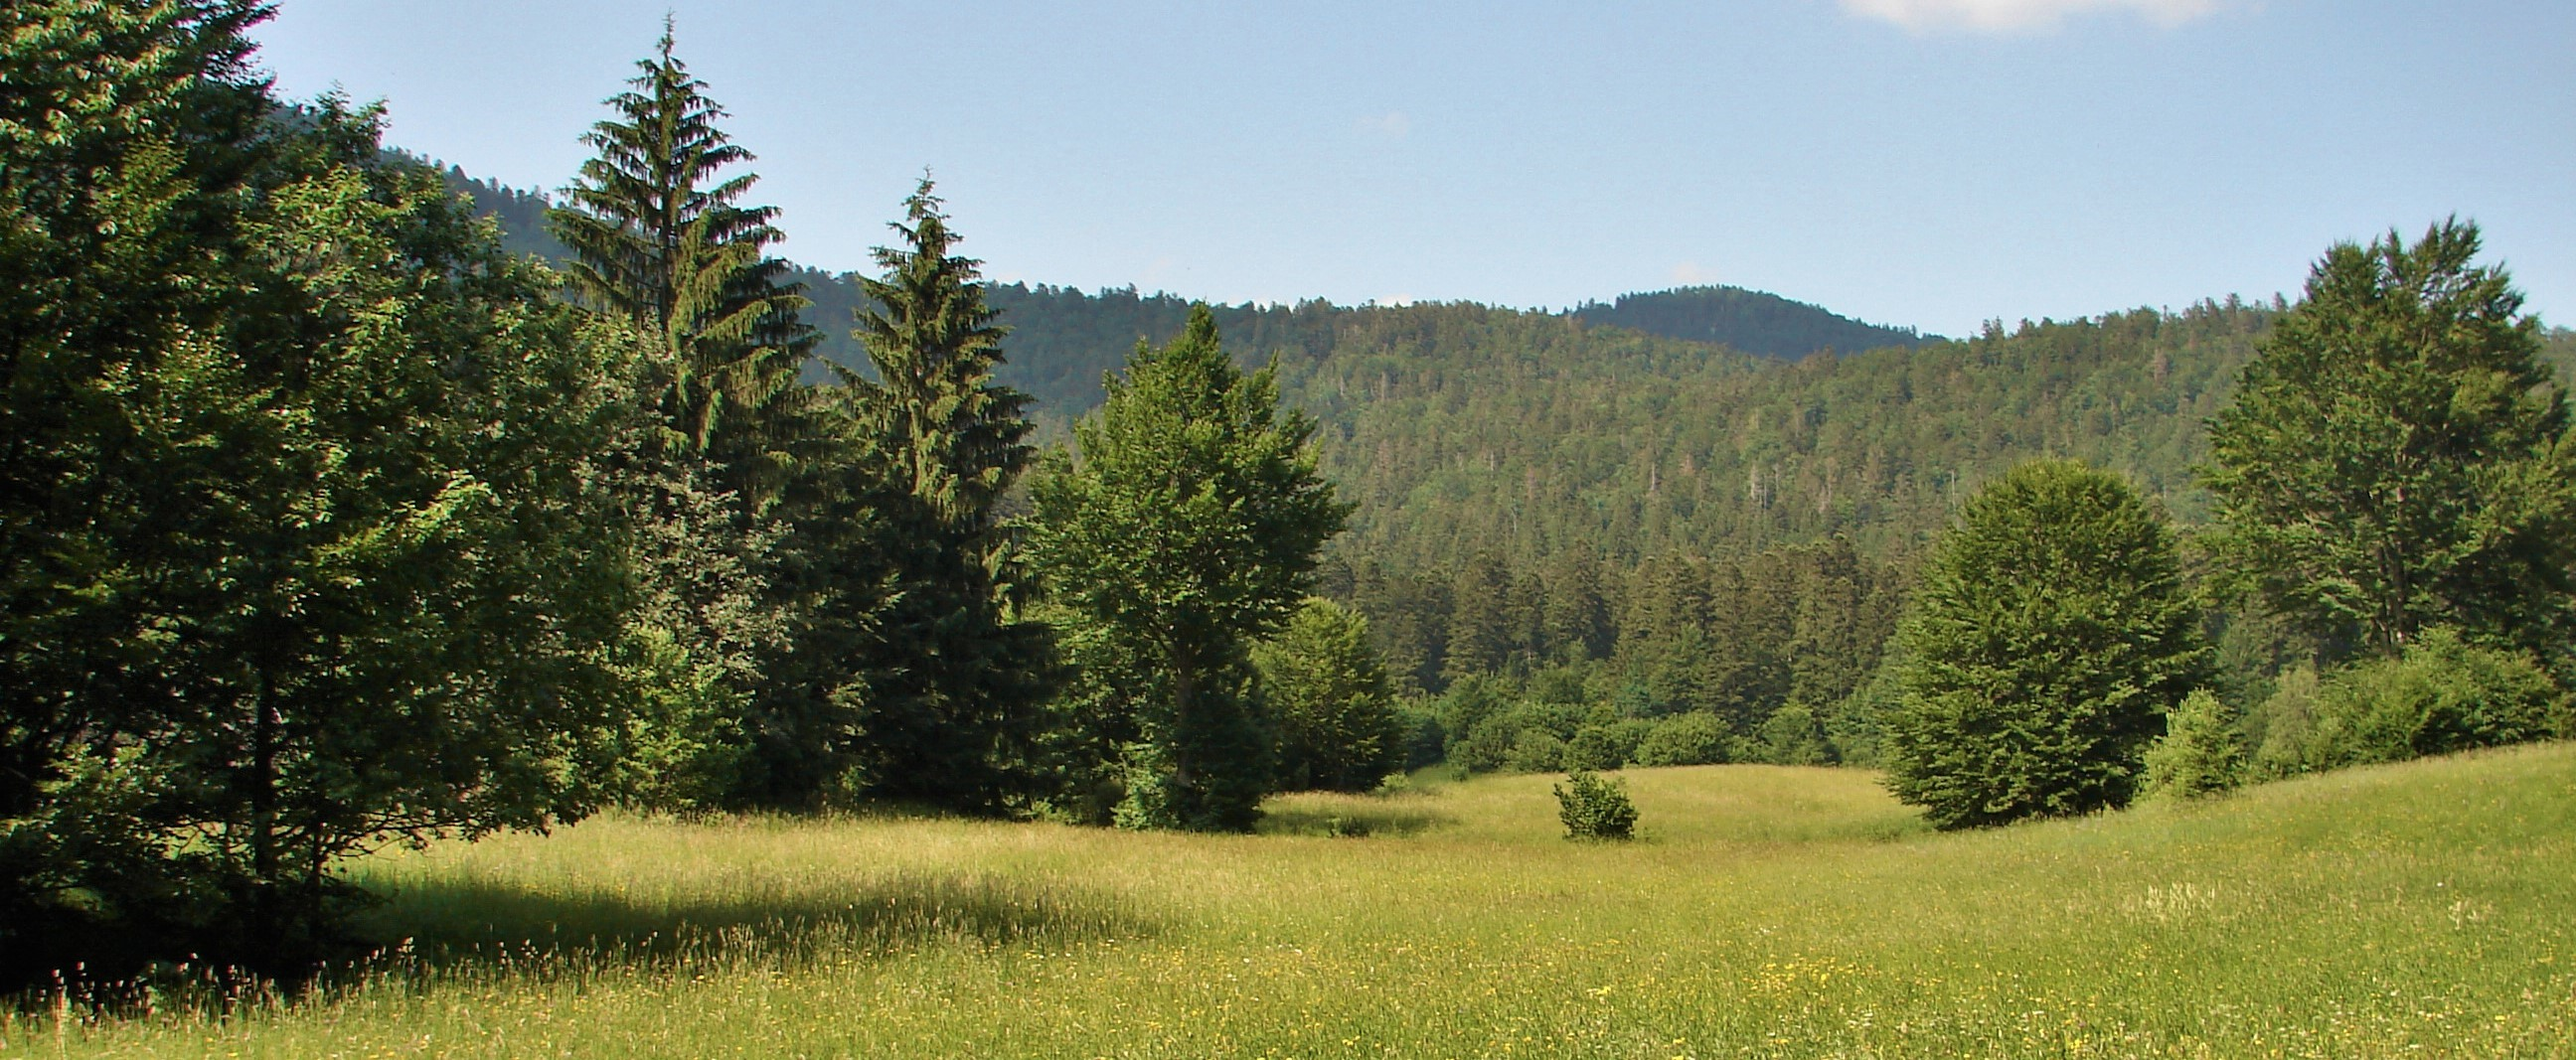 Kamo na izlet? Poučna staza Leska i Nacionalni park Risnjak, Gorski kotar - oaza mira i zelenila na putu između Zagreba i mora